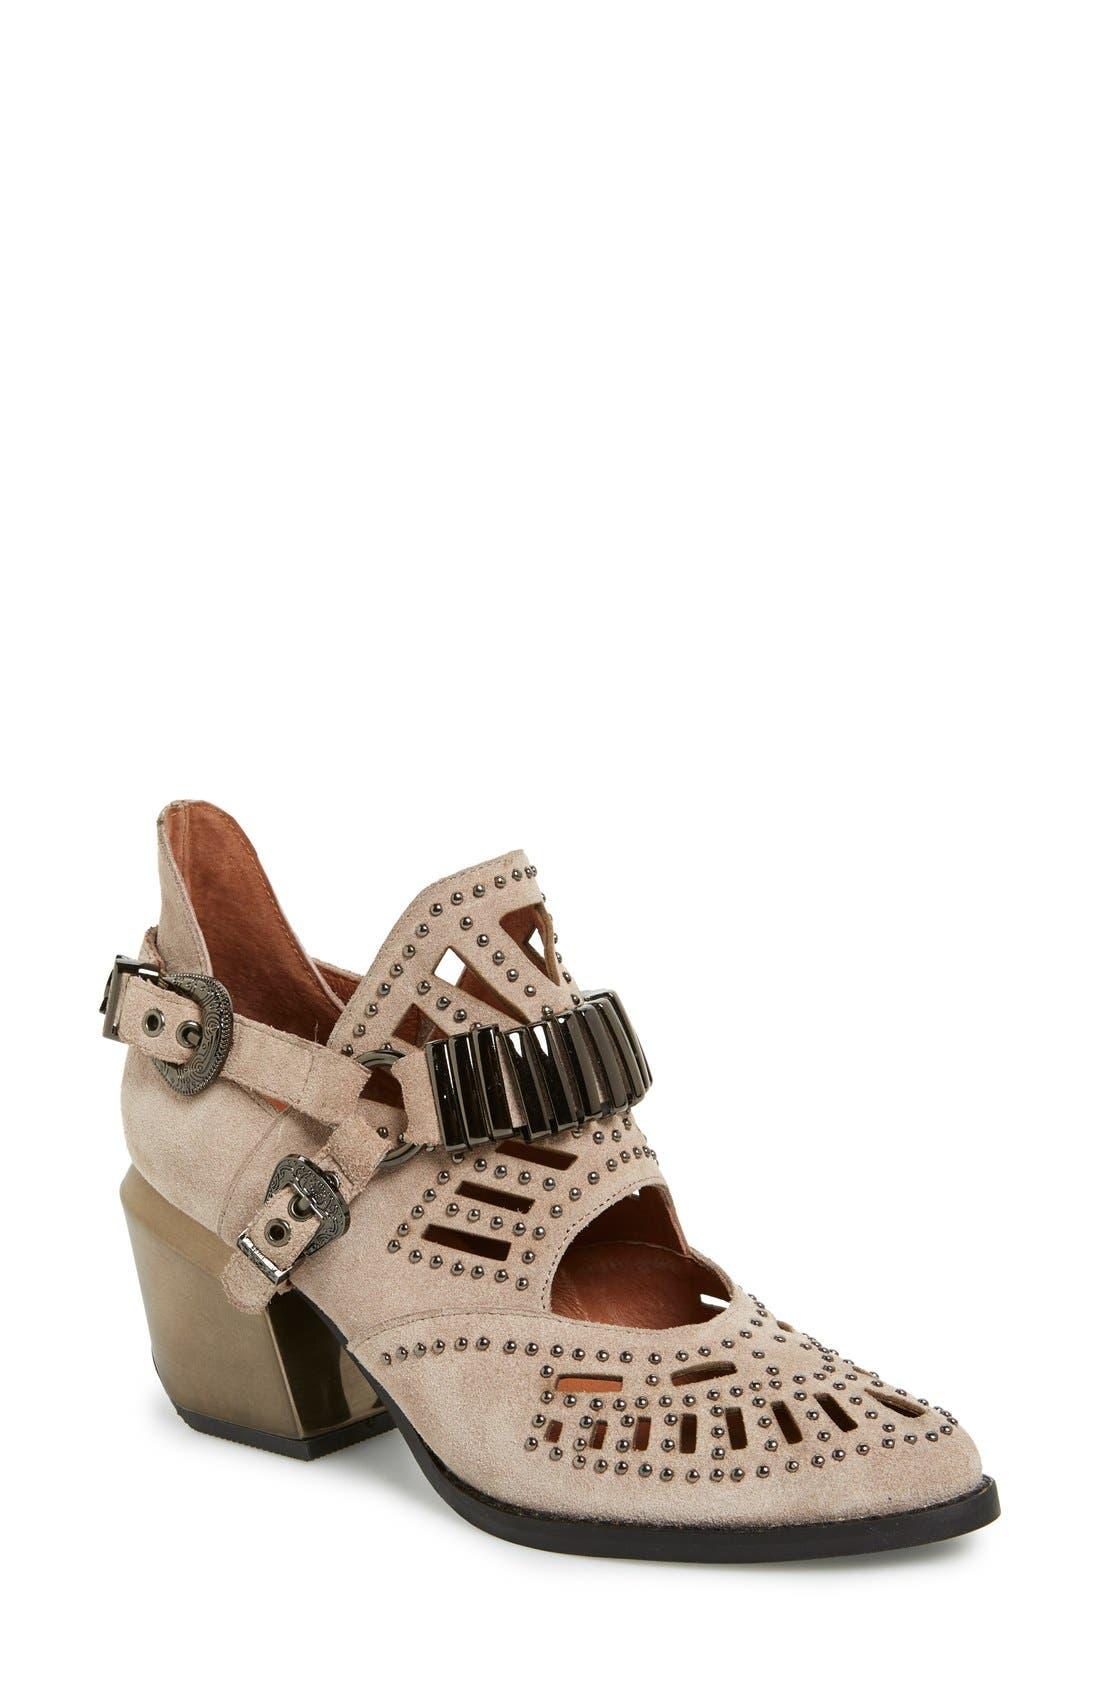 Main Image - Jeffrey Campbell 'Calhoun' Ankle Boot (Women)